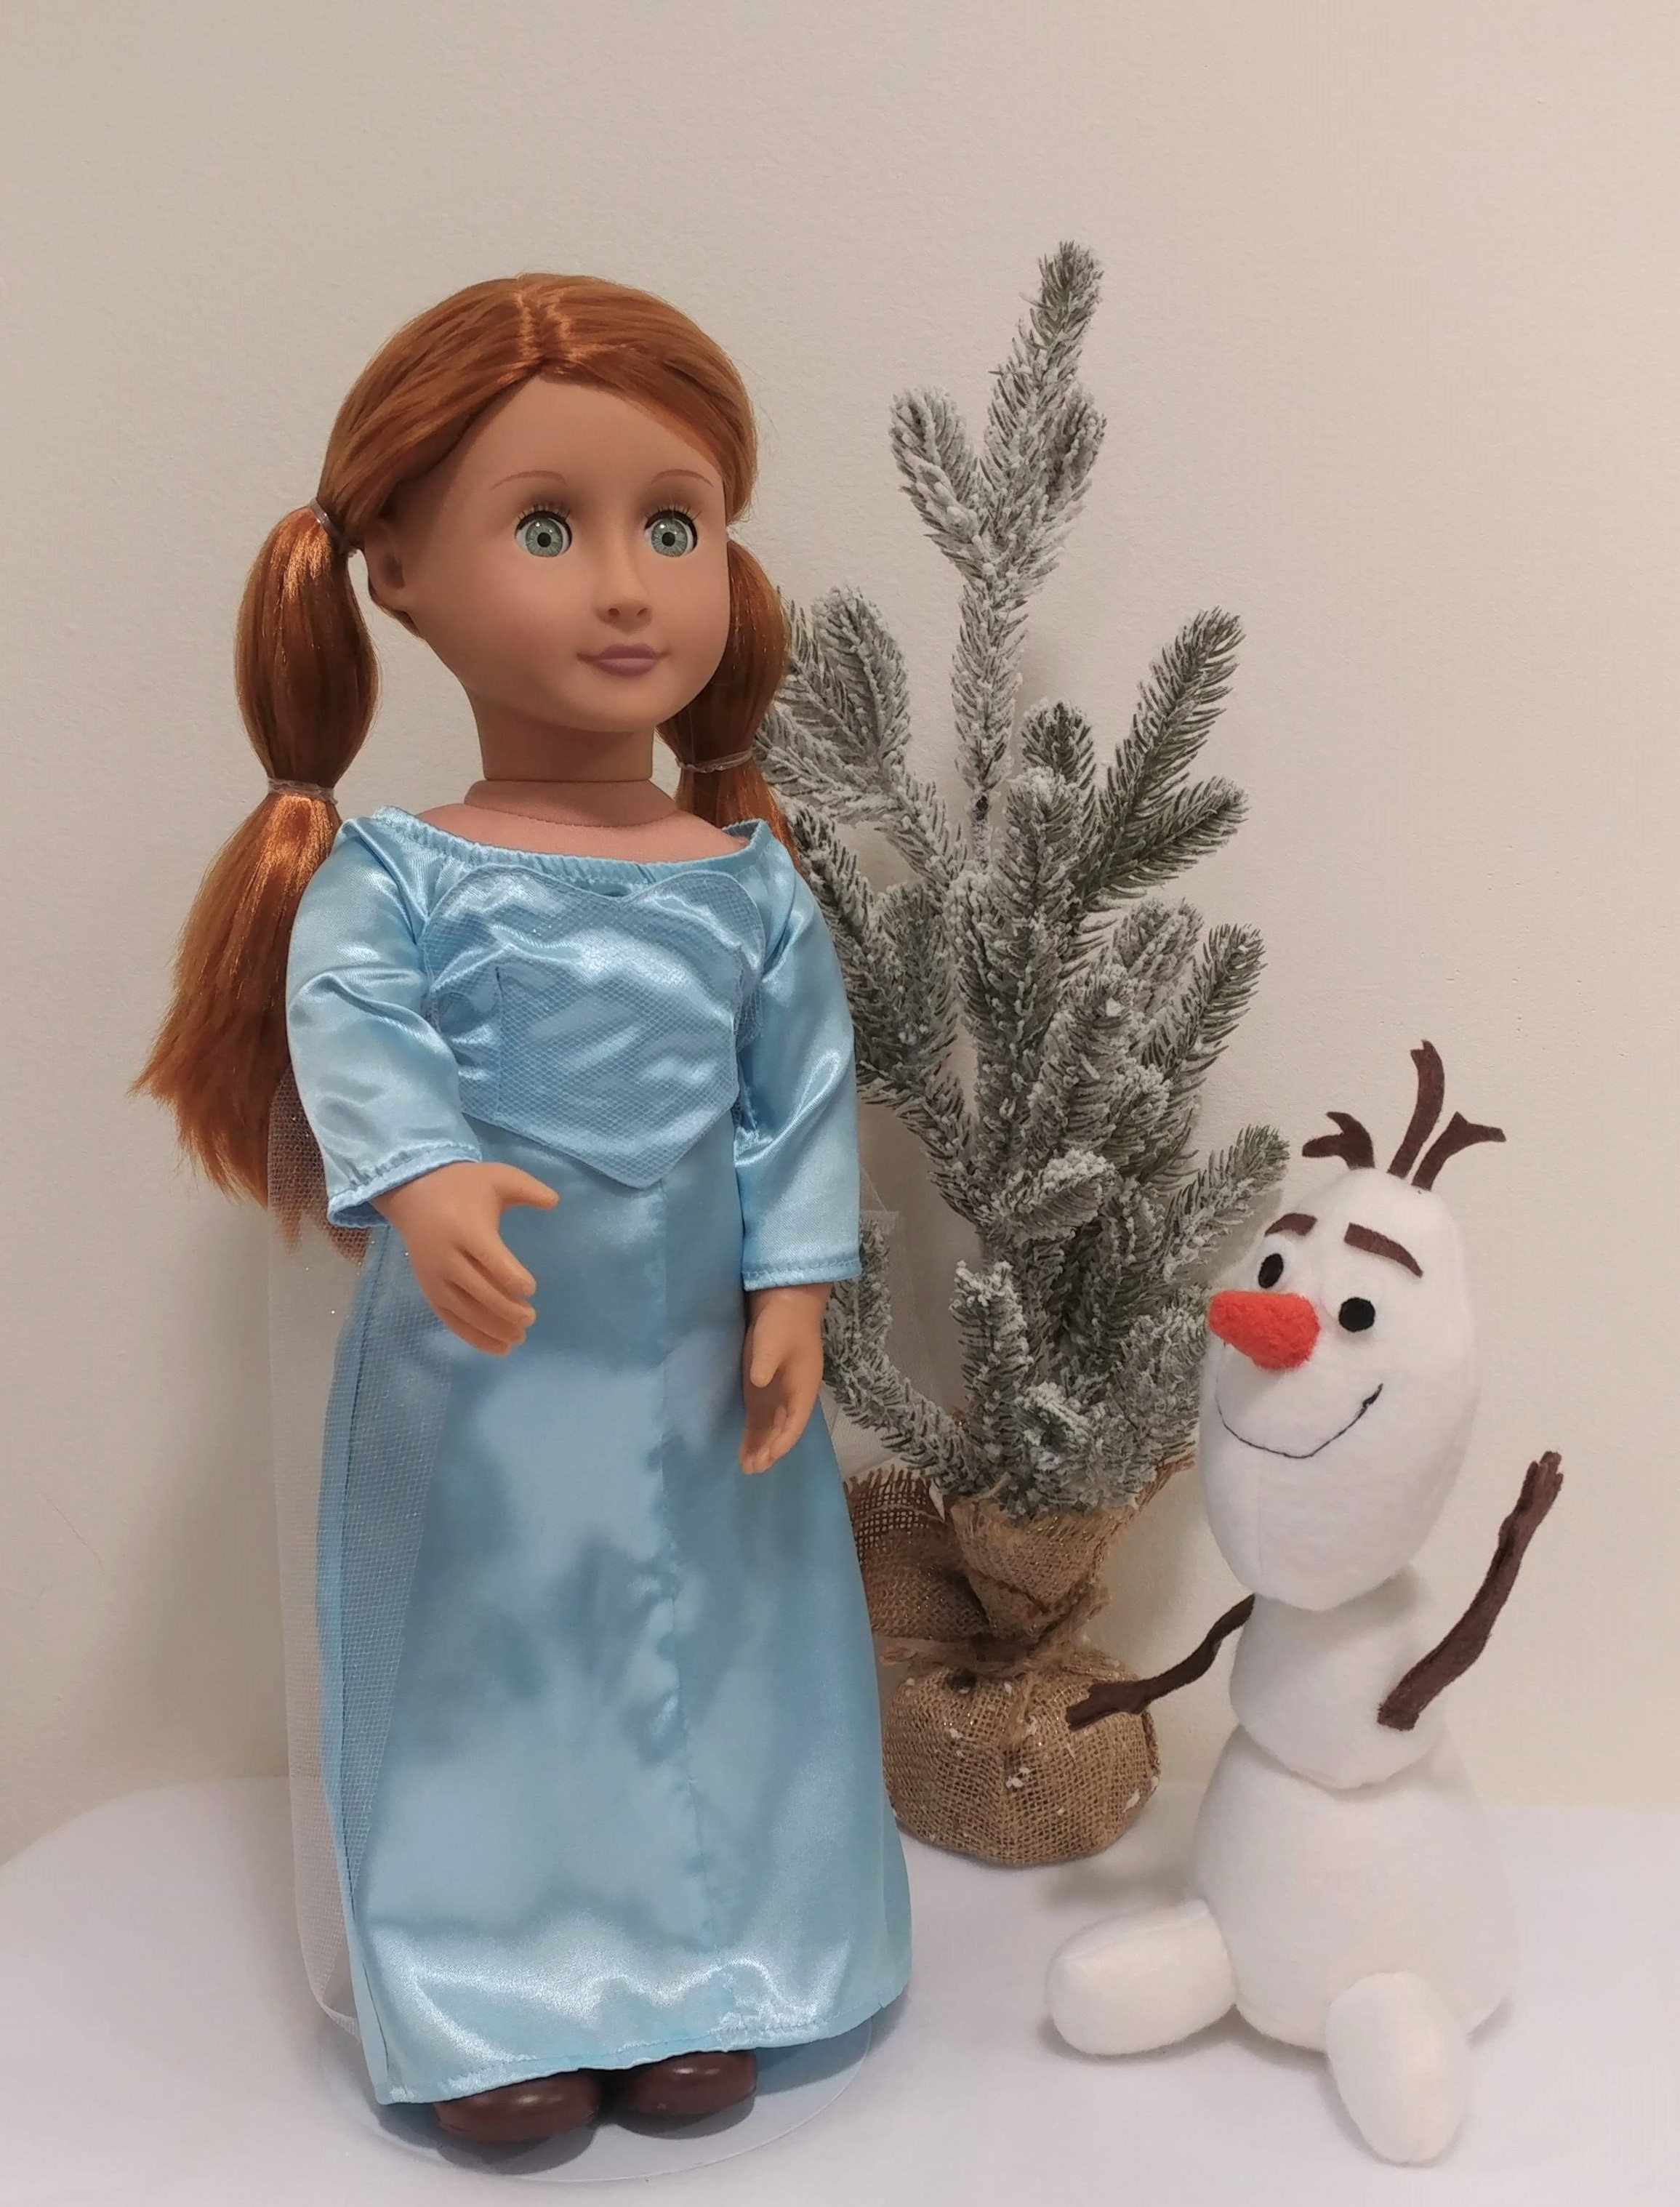 Frozen AMG Doll